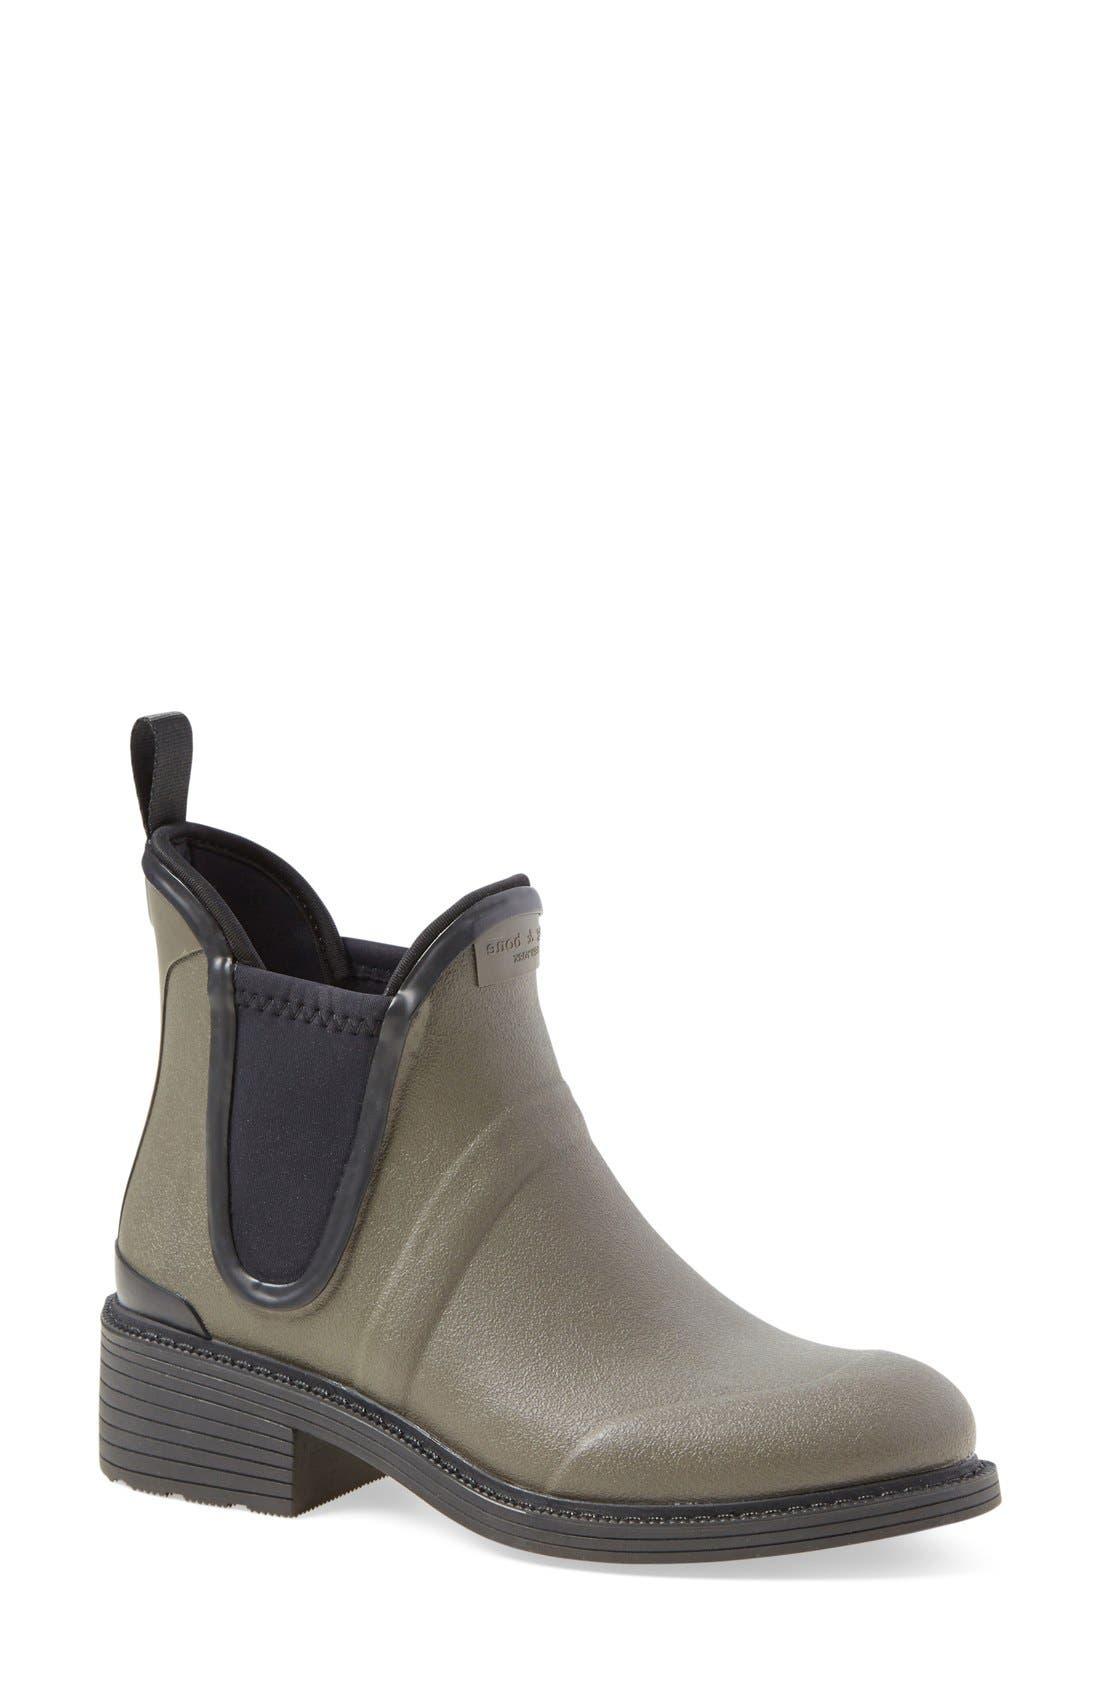 Main Image - rag & bone 'Dartford' Rubber Boot (Women)